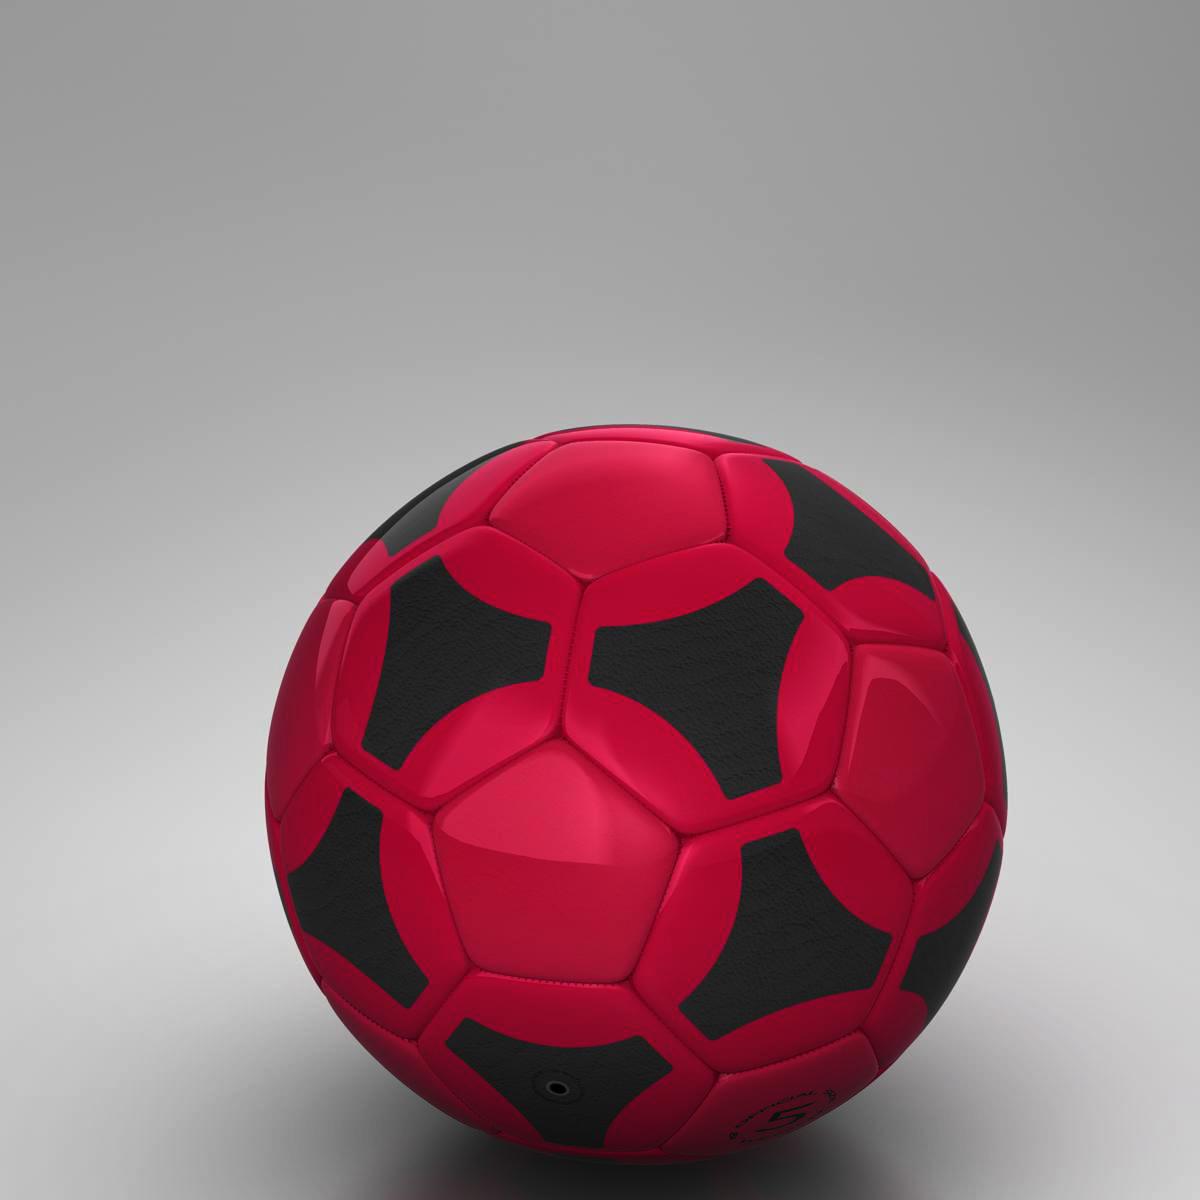 soccerball red black 3d model 3ds max fbx c4d ma mb obj 204555